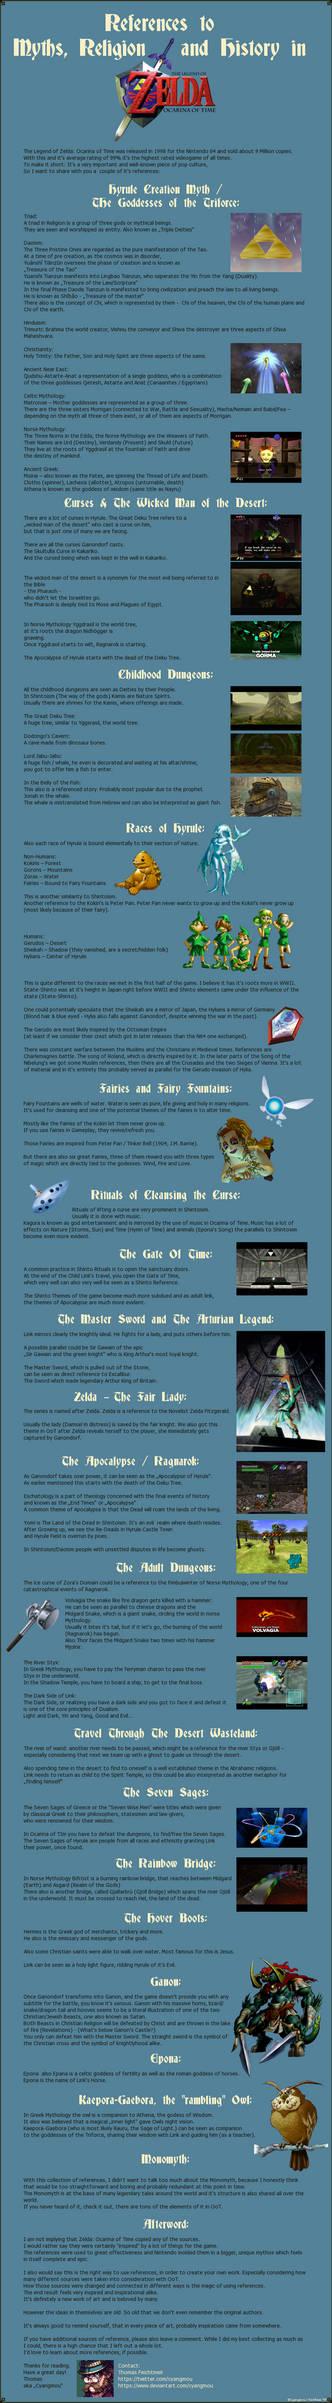 References in Zelda Ocarina of Time